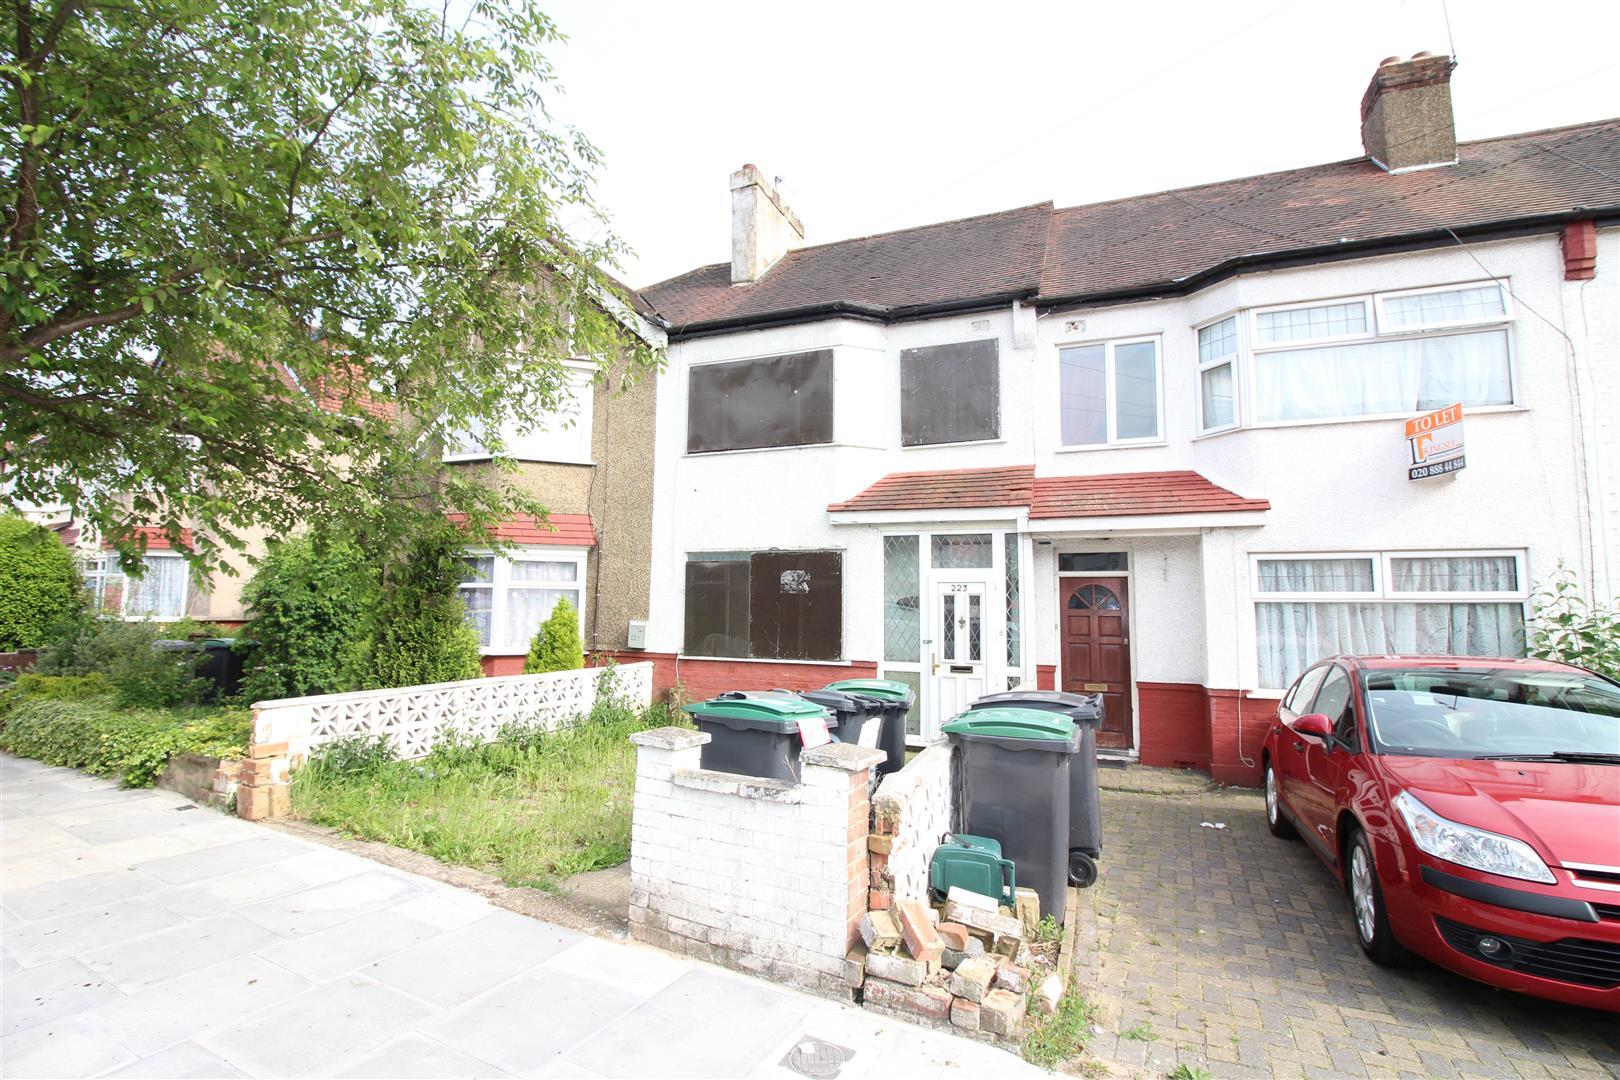 Devonshire Hill Lane, Tottenham, N17